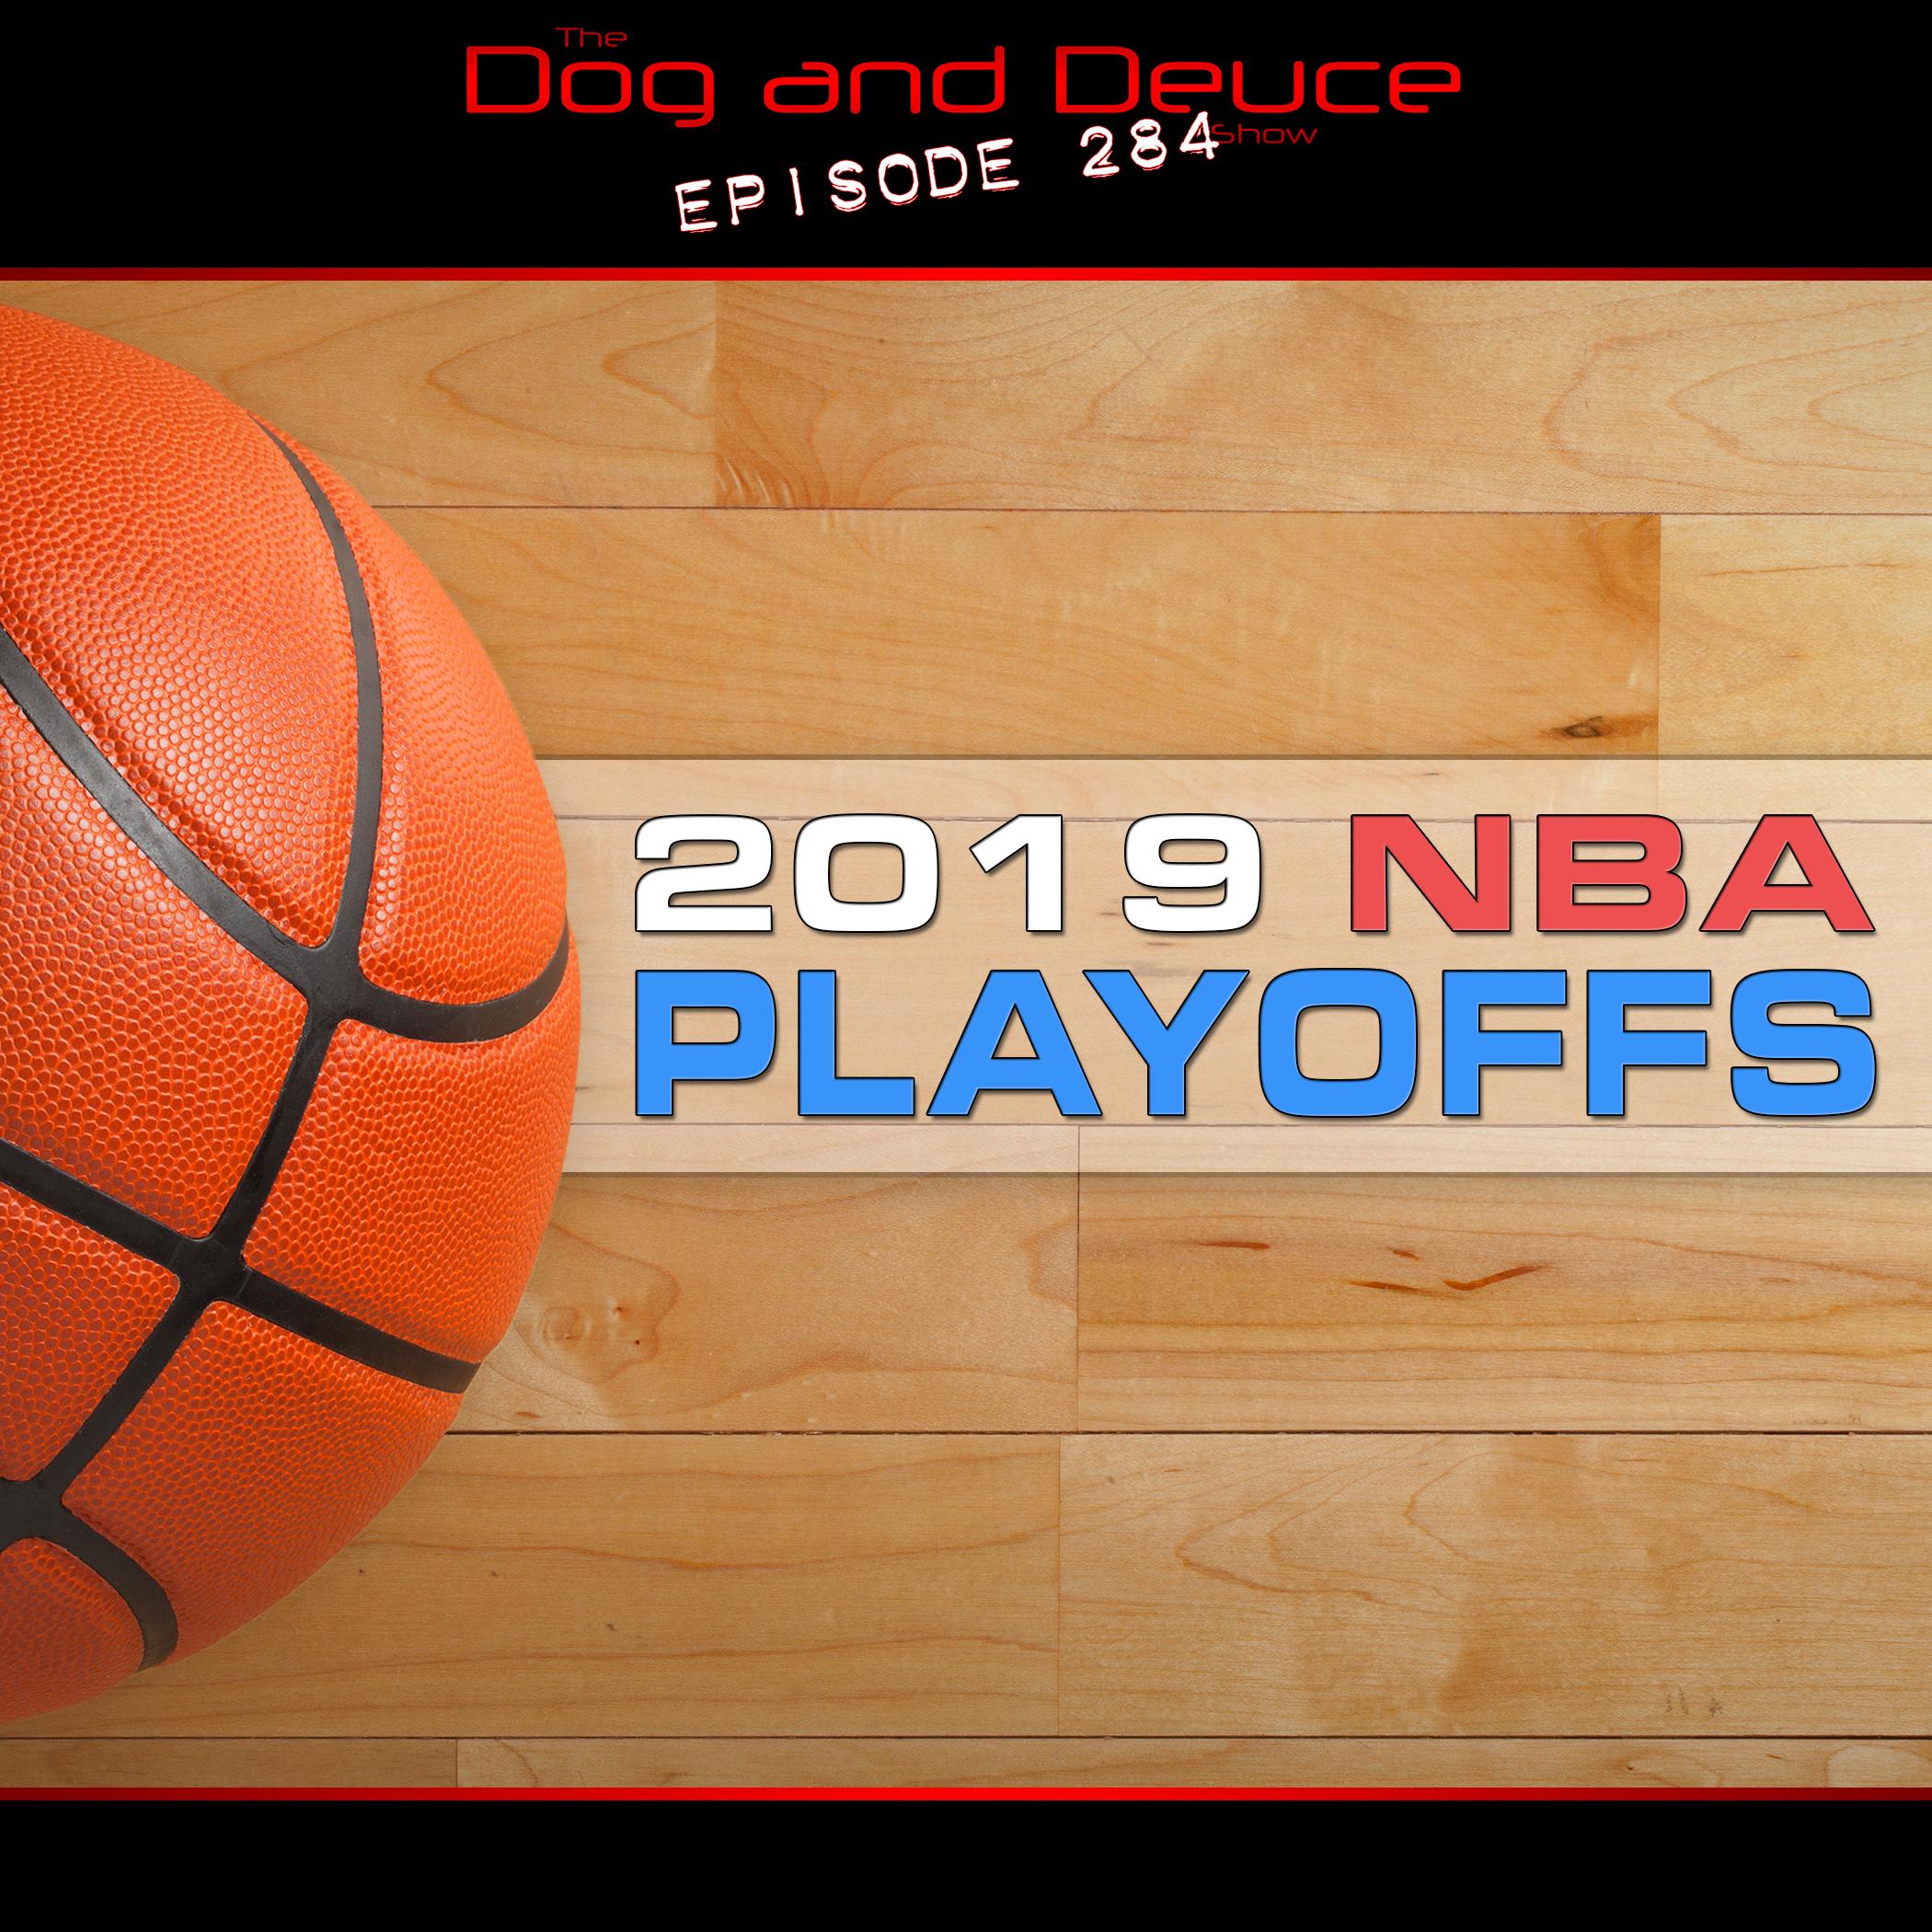 Houston Rockets Vs Utah Jazz: Jazz Vs Rockets Preview! Plus Magic Bails And Korver